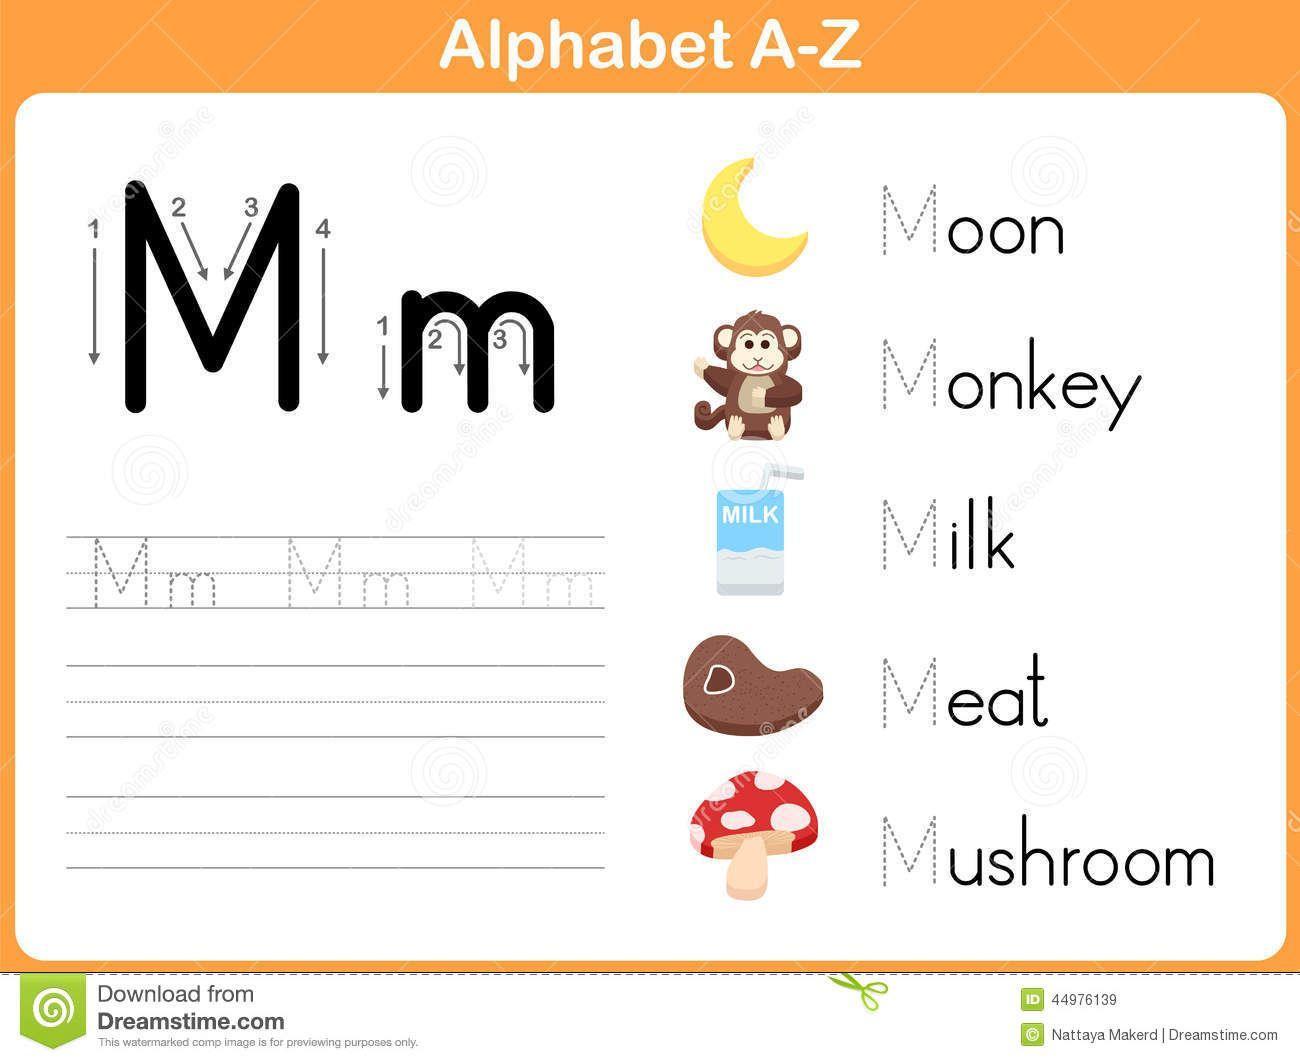 Preschool Writing Worksheets A-z For Beginners 5